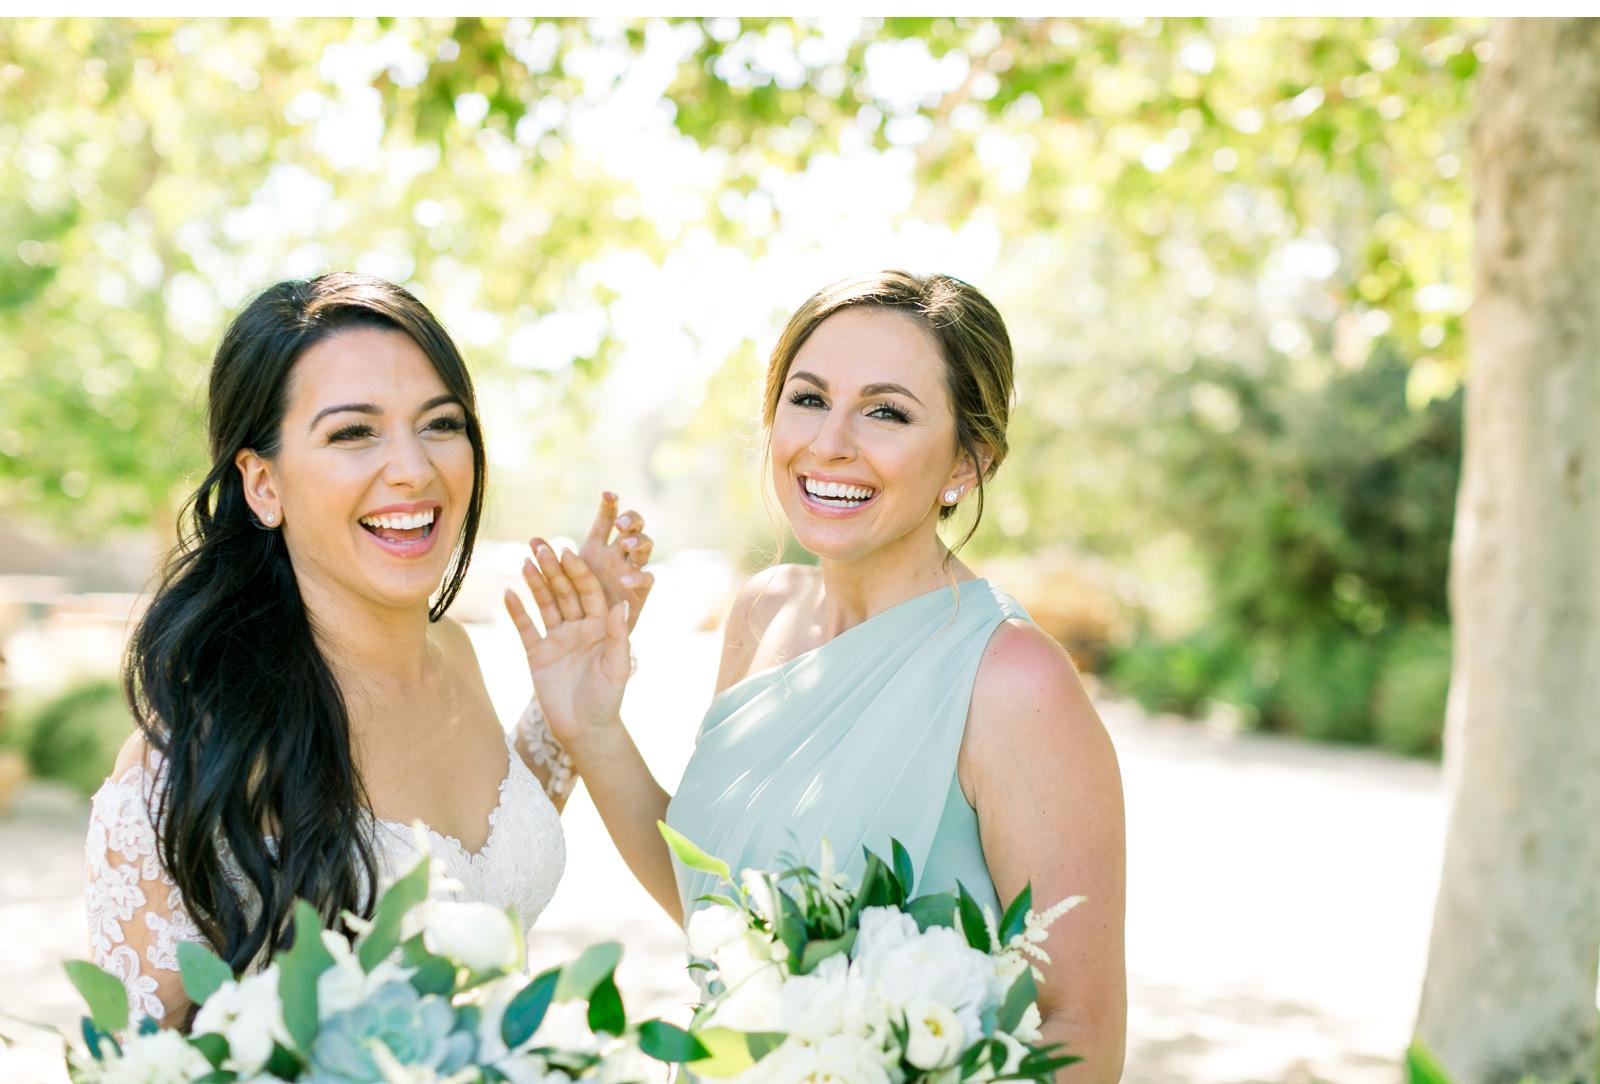 Southern-California-Weddings-Natalie-Schutt-Photography-Weddings_14.jpg